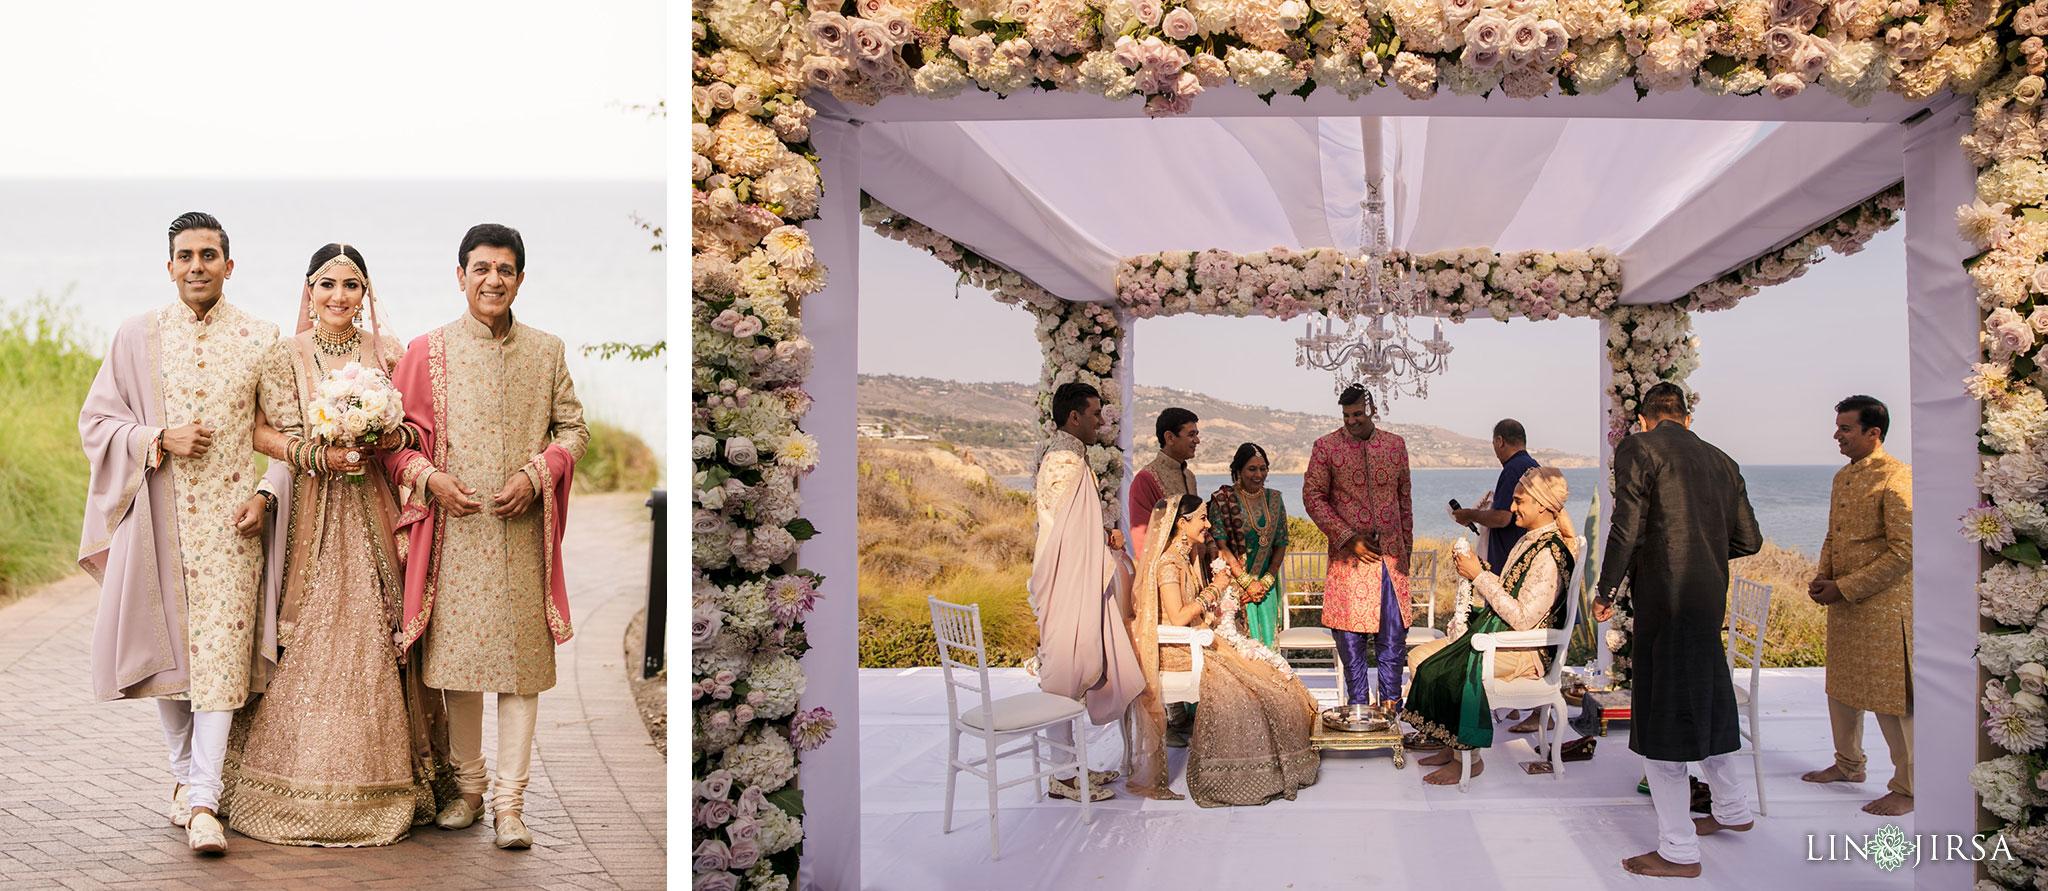 030 terranea resort palos verdes indian ceremony wedding photography